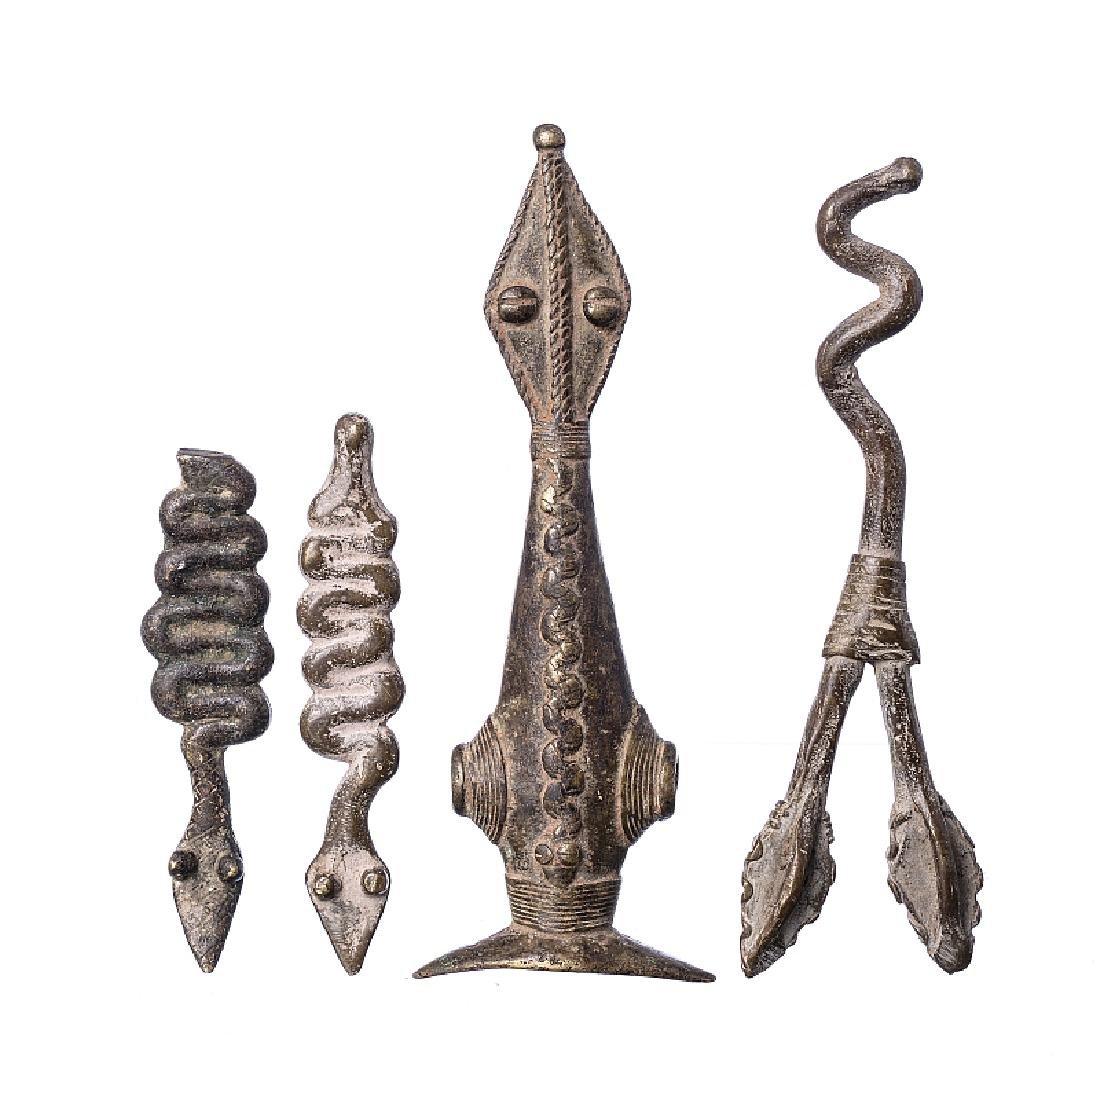 GAN - Four bronze sculptures